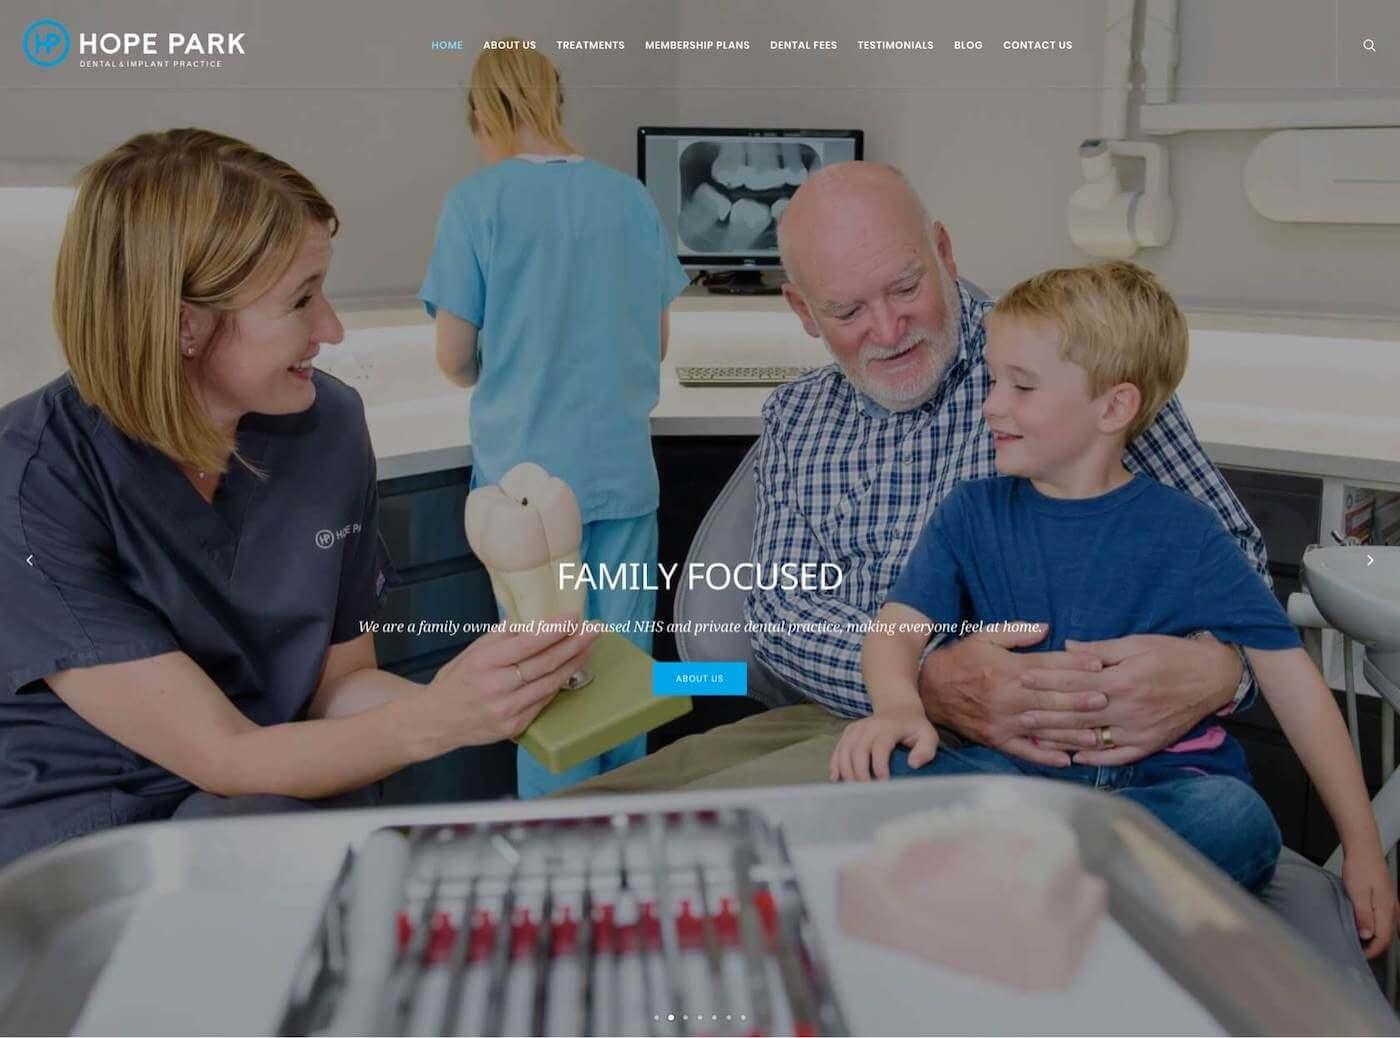 Web design for Hope Park Dental Practice, Edinburgh